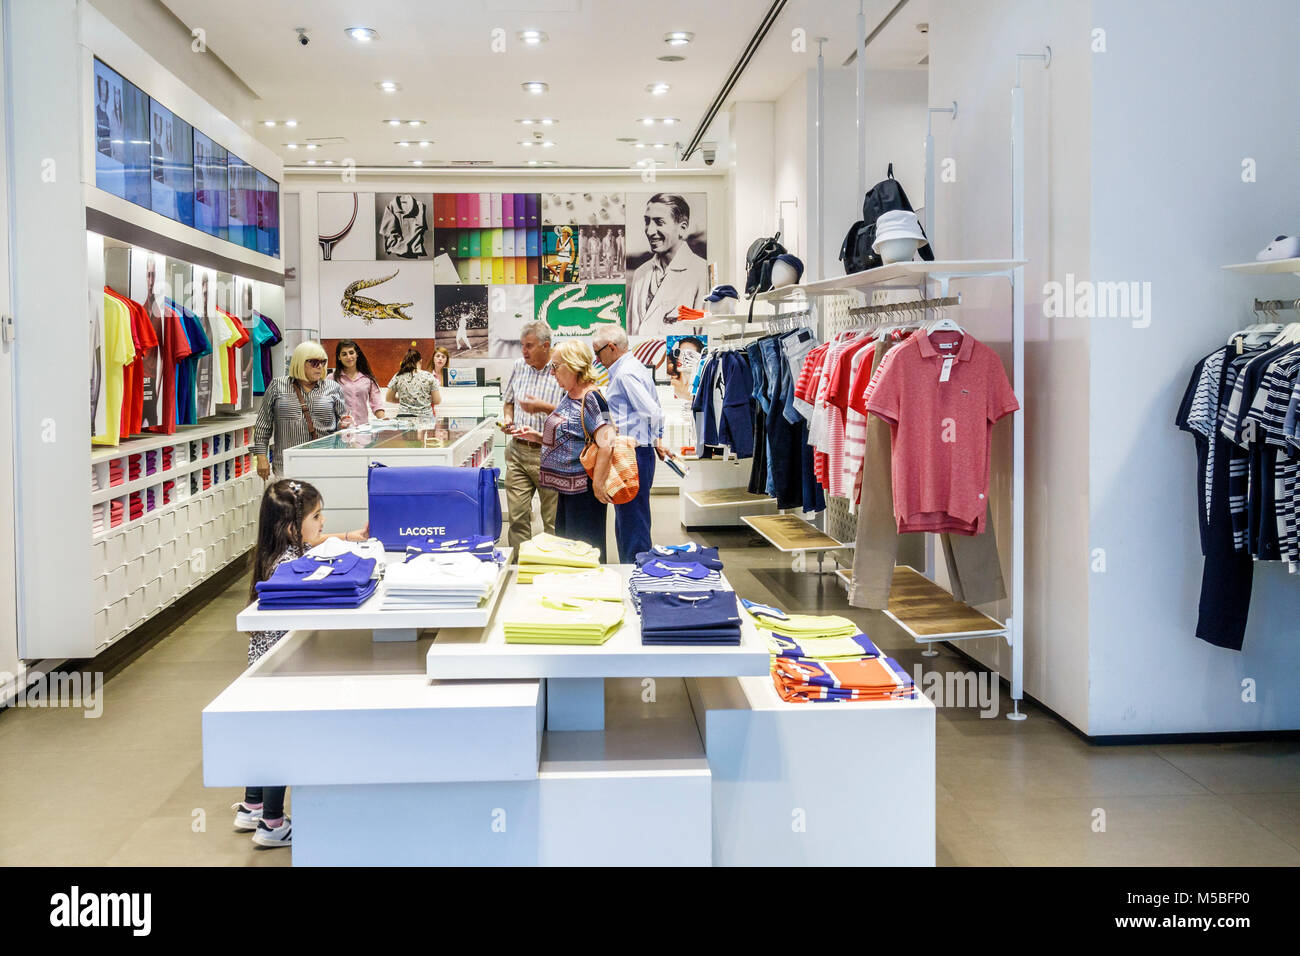 29f3fe1554c6 Argentine Buenos Aires Avenida Cordoba Galerias Pacifico mall shopping  center centre commercial à l'intérieur